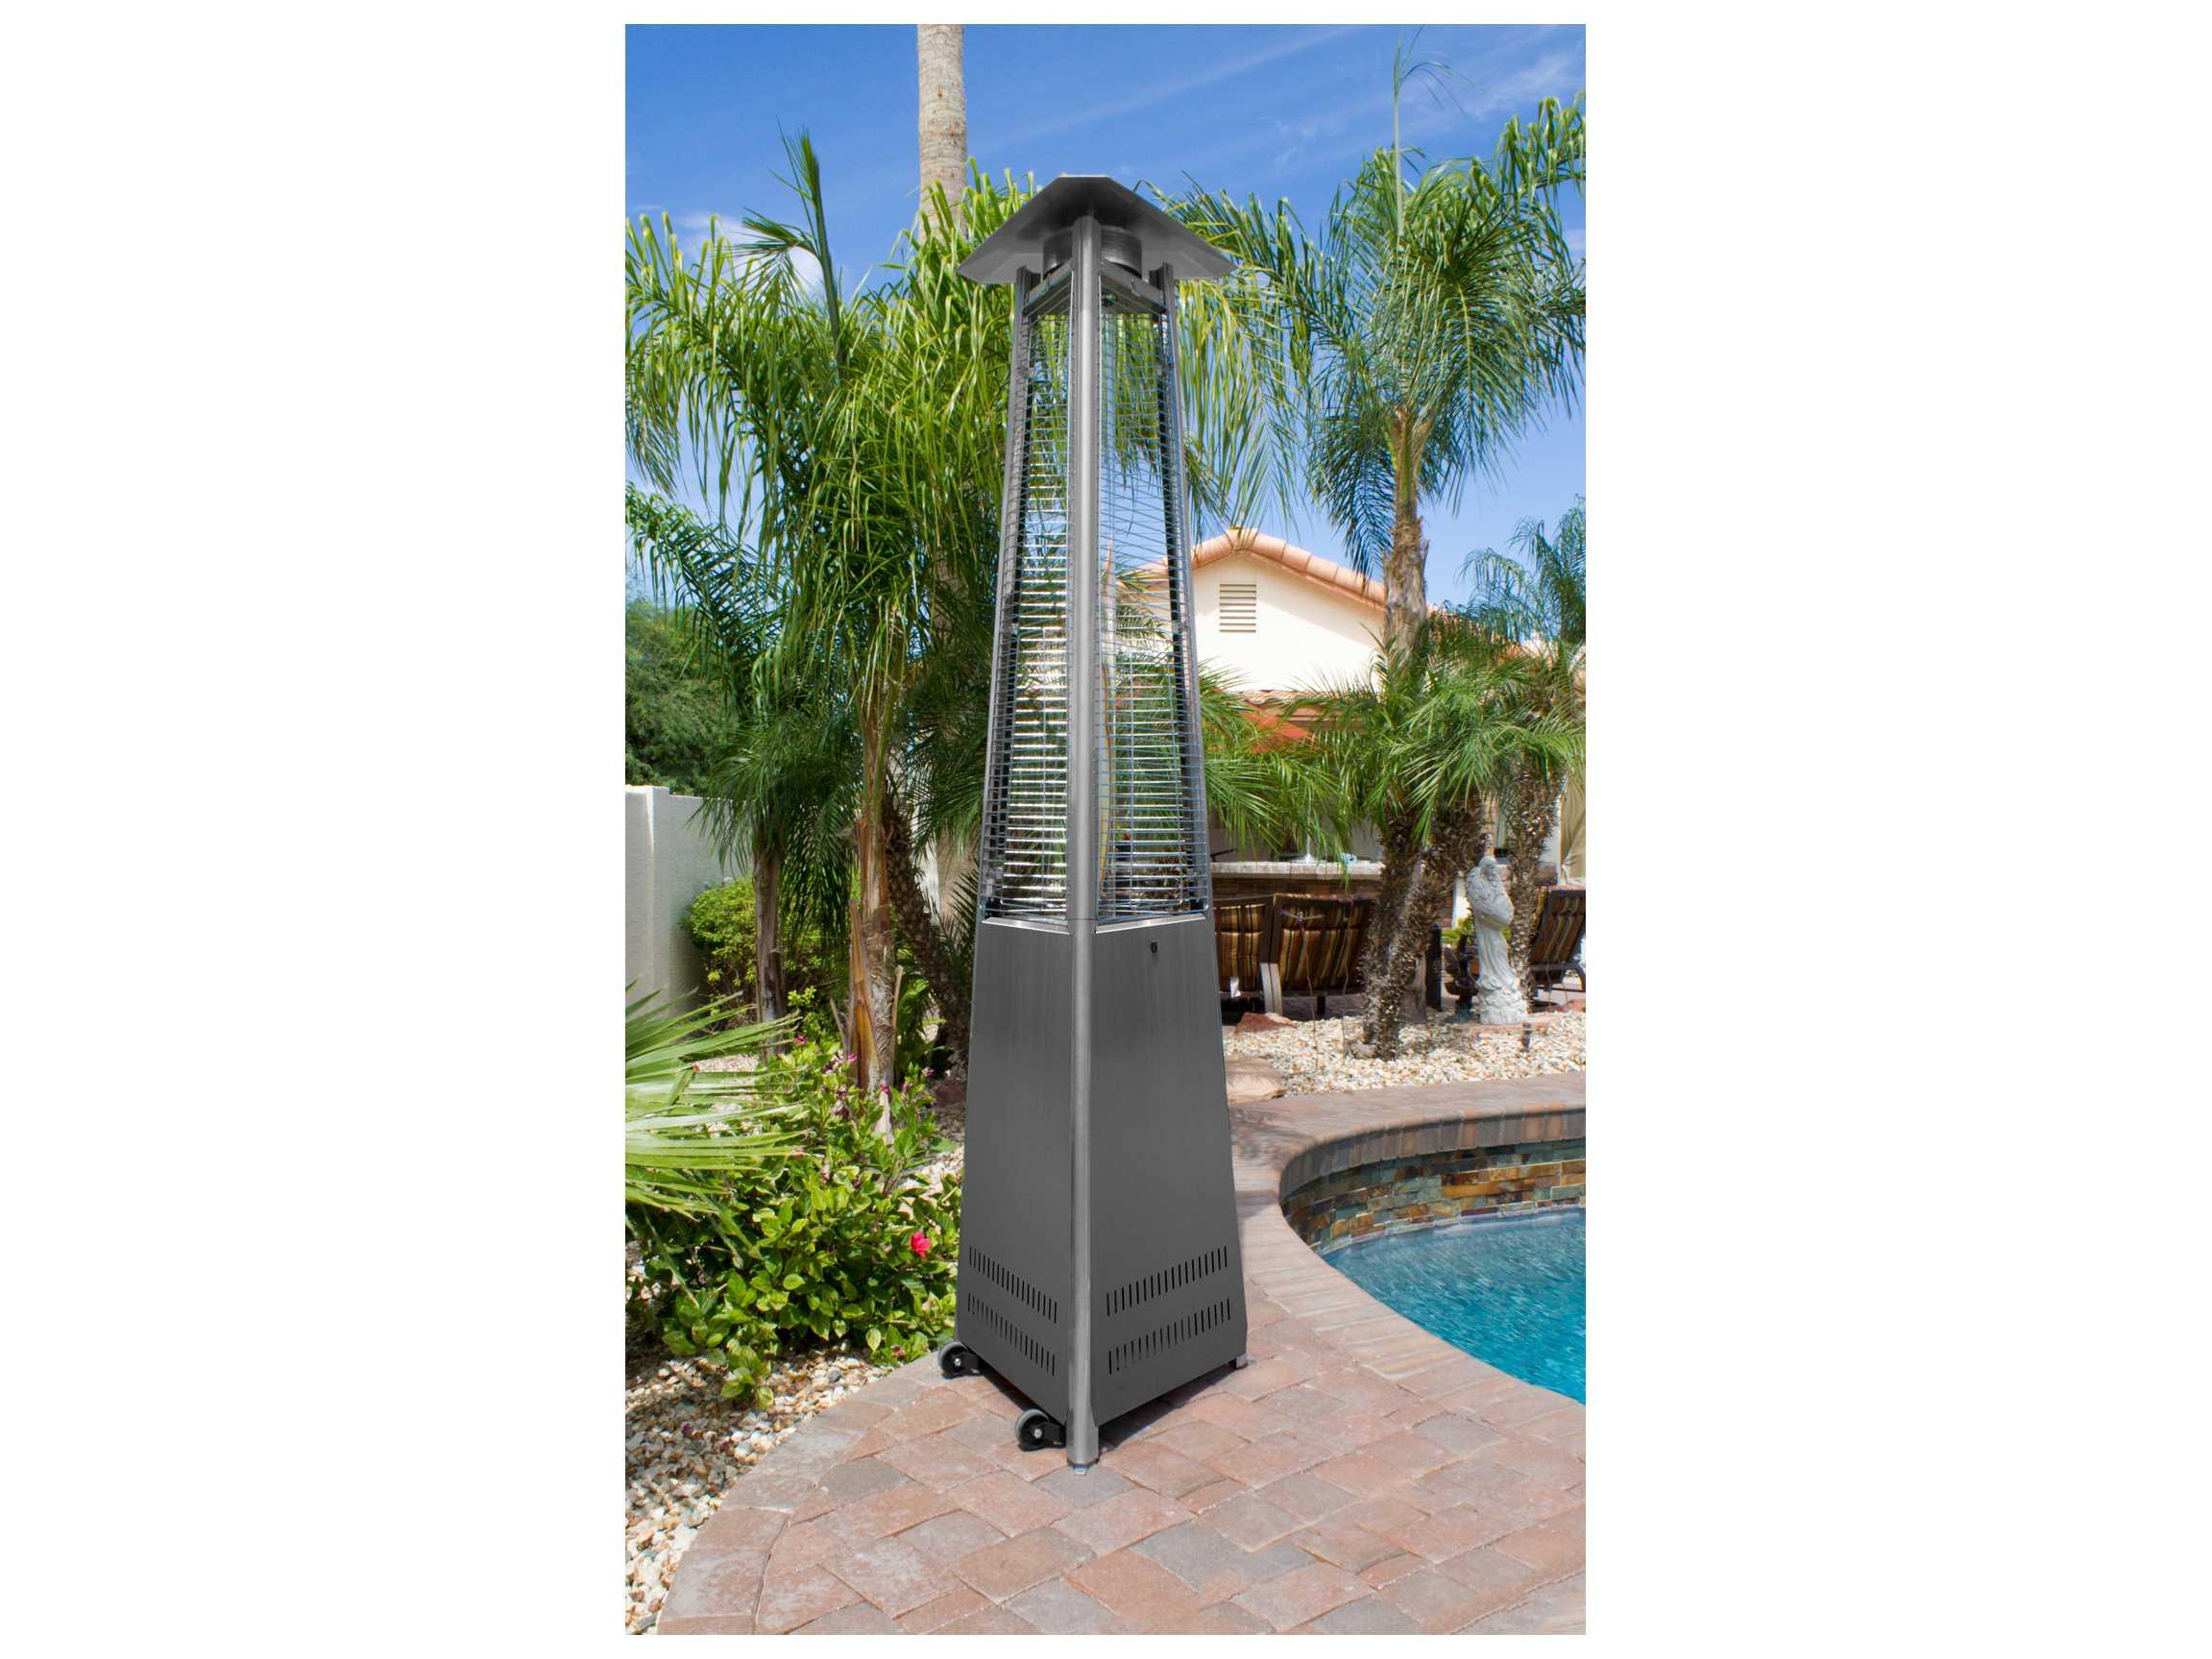 wont pc cg size sahara light parts tabletop heaters hps full ideas uline reviews of az c patio heater